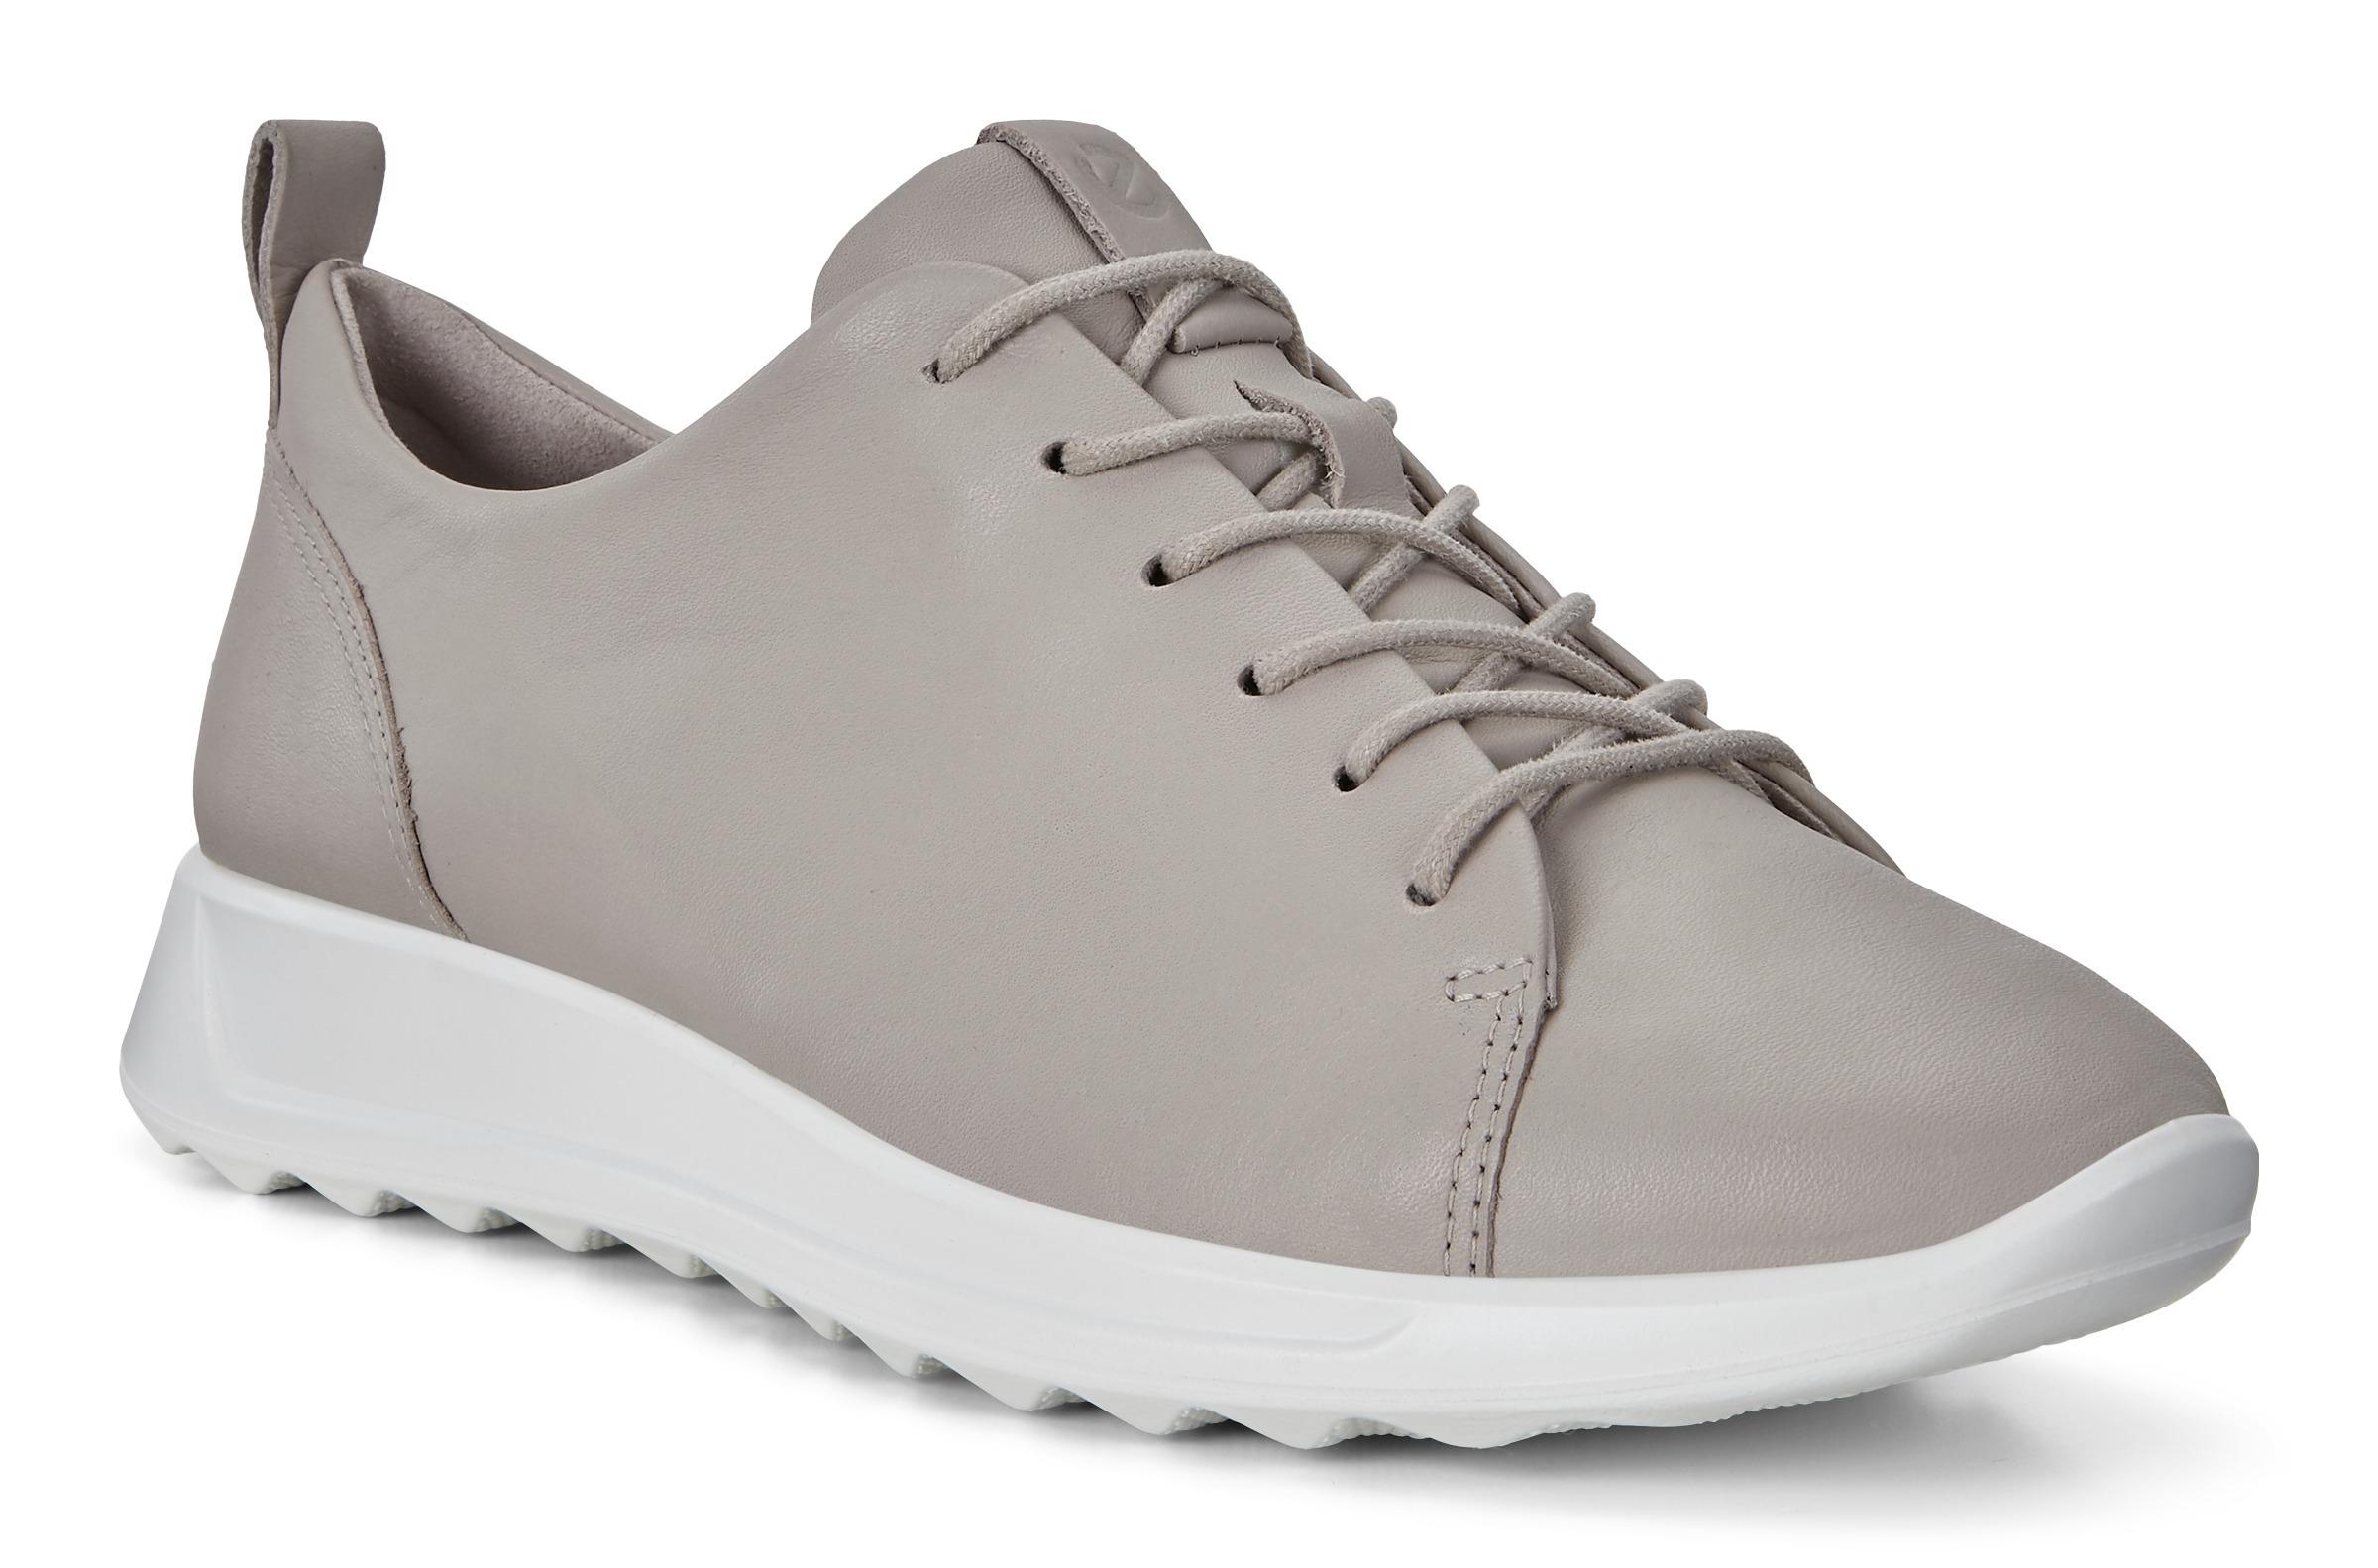 Neueste Ecco Cool Flache Schuhe Damen Schwarz Online Shop